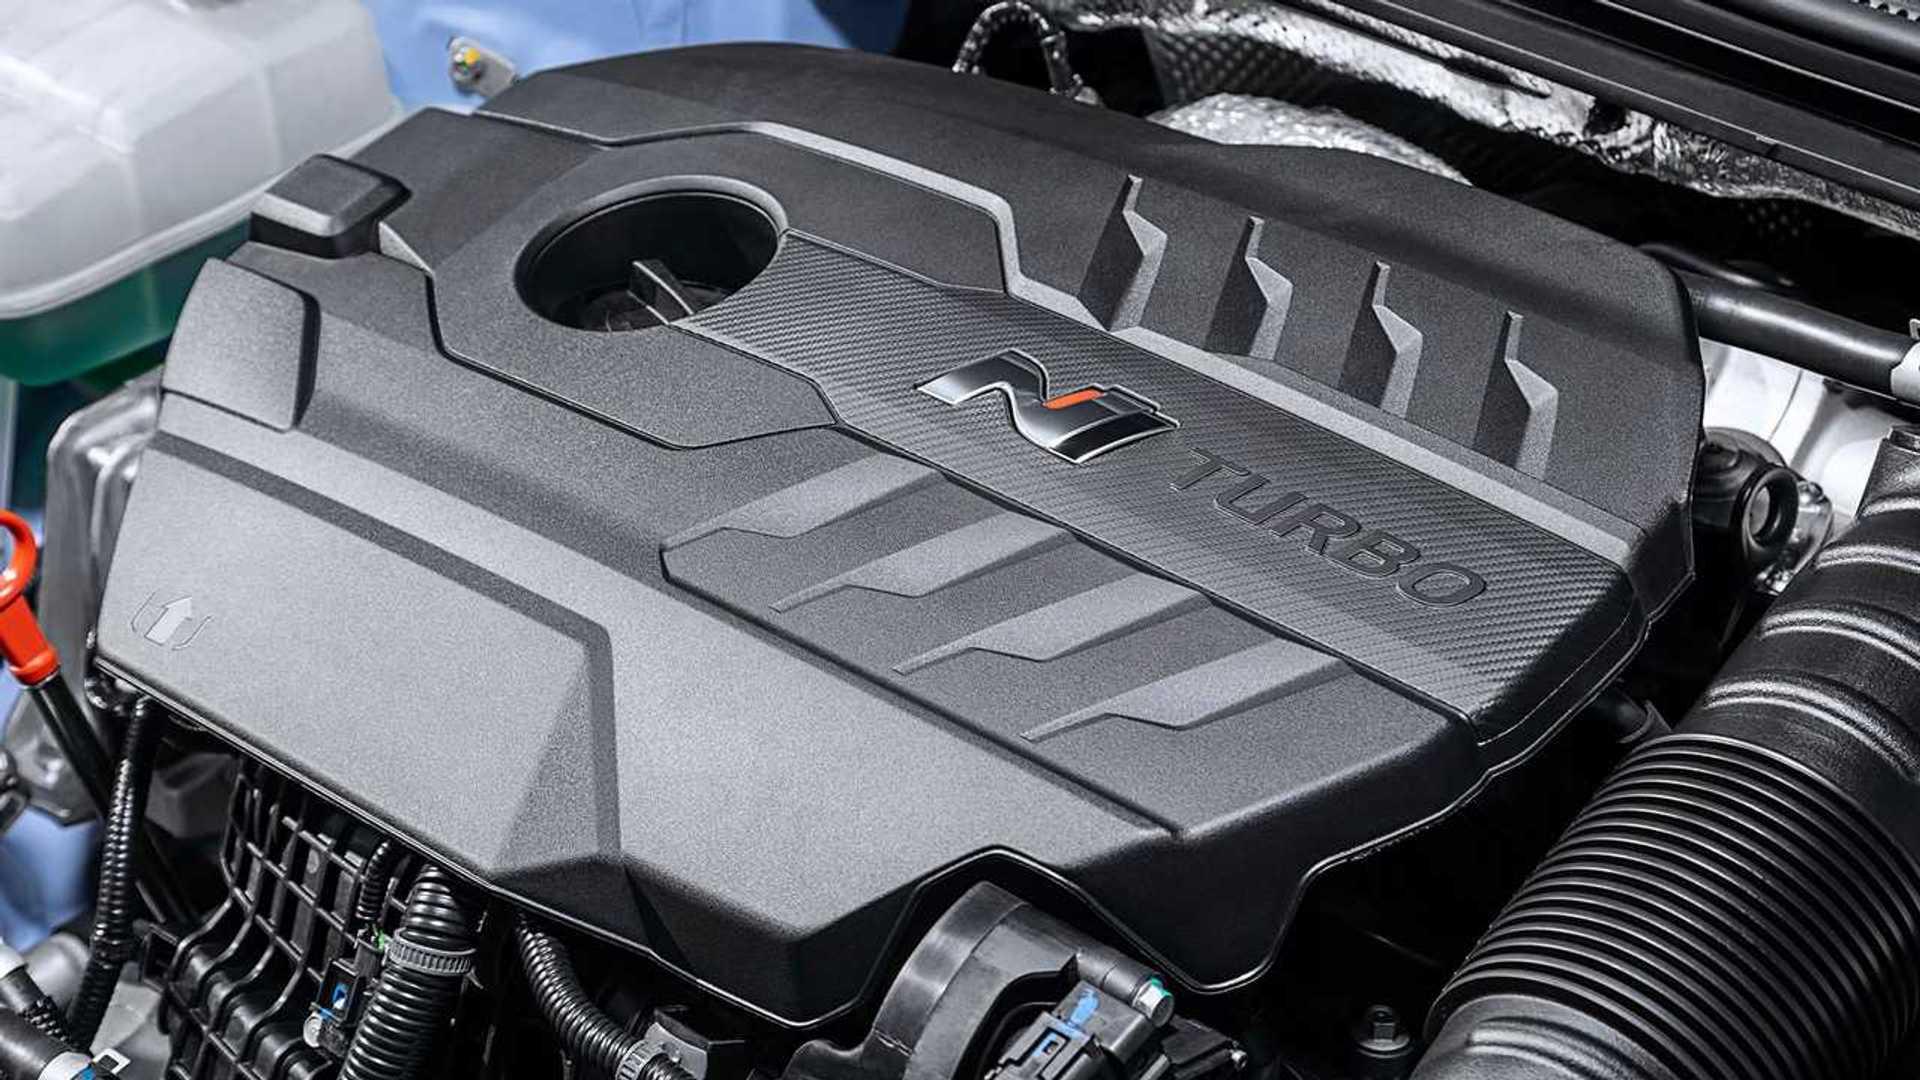 Hyundai Working On 2.3-Liter Turbo Engine With 7,000 RPM Redline